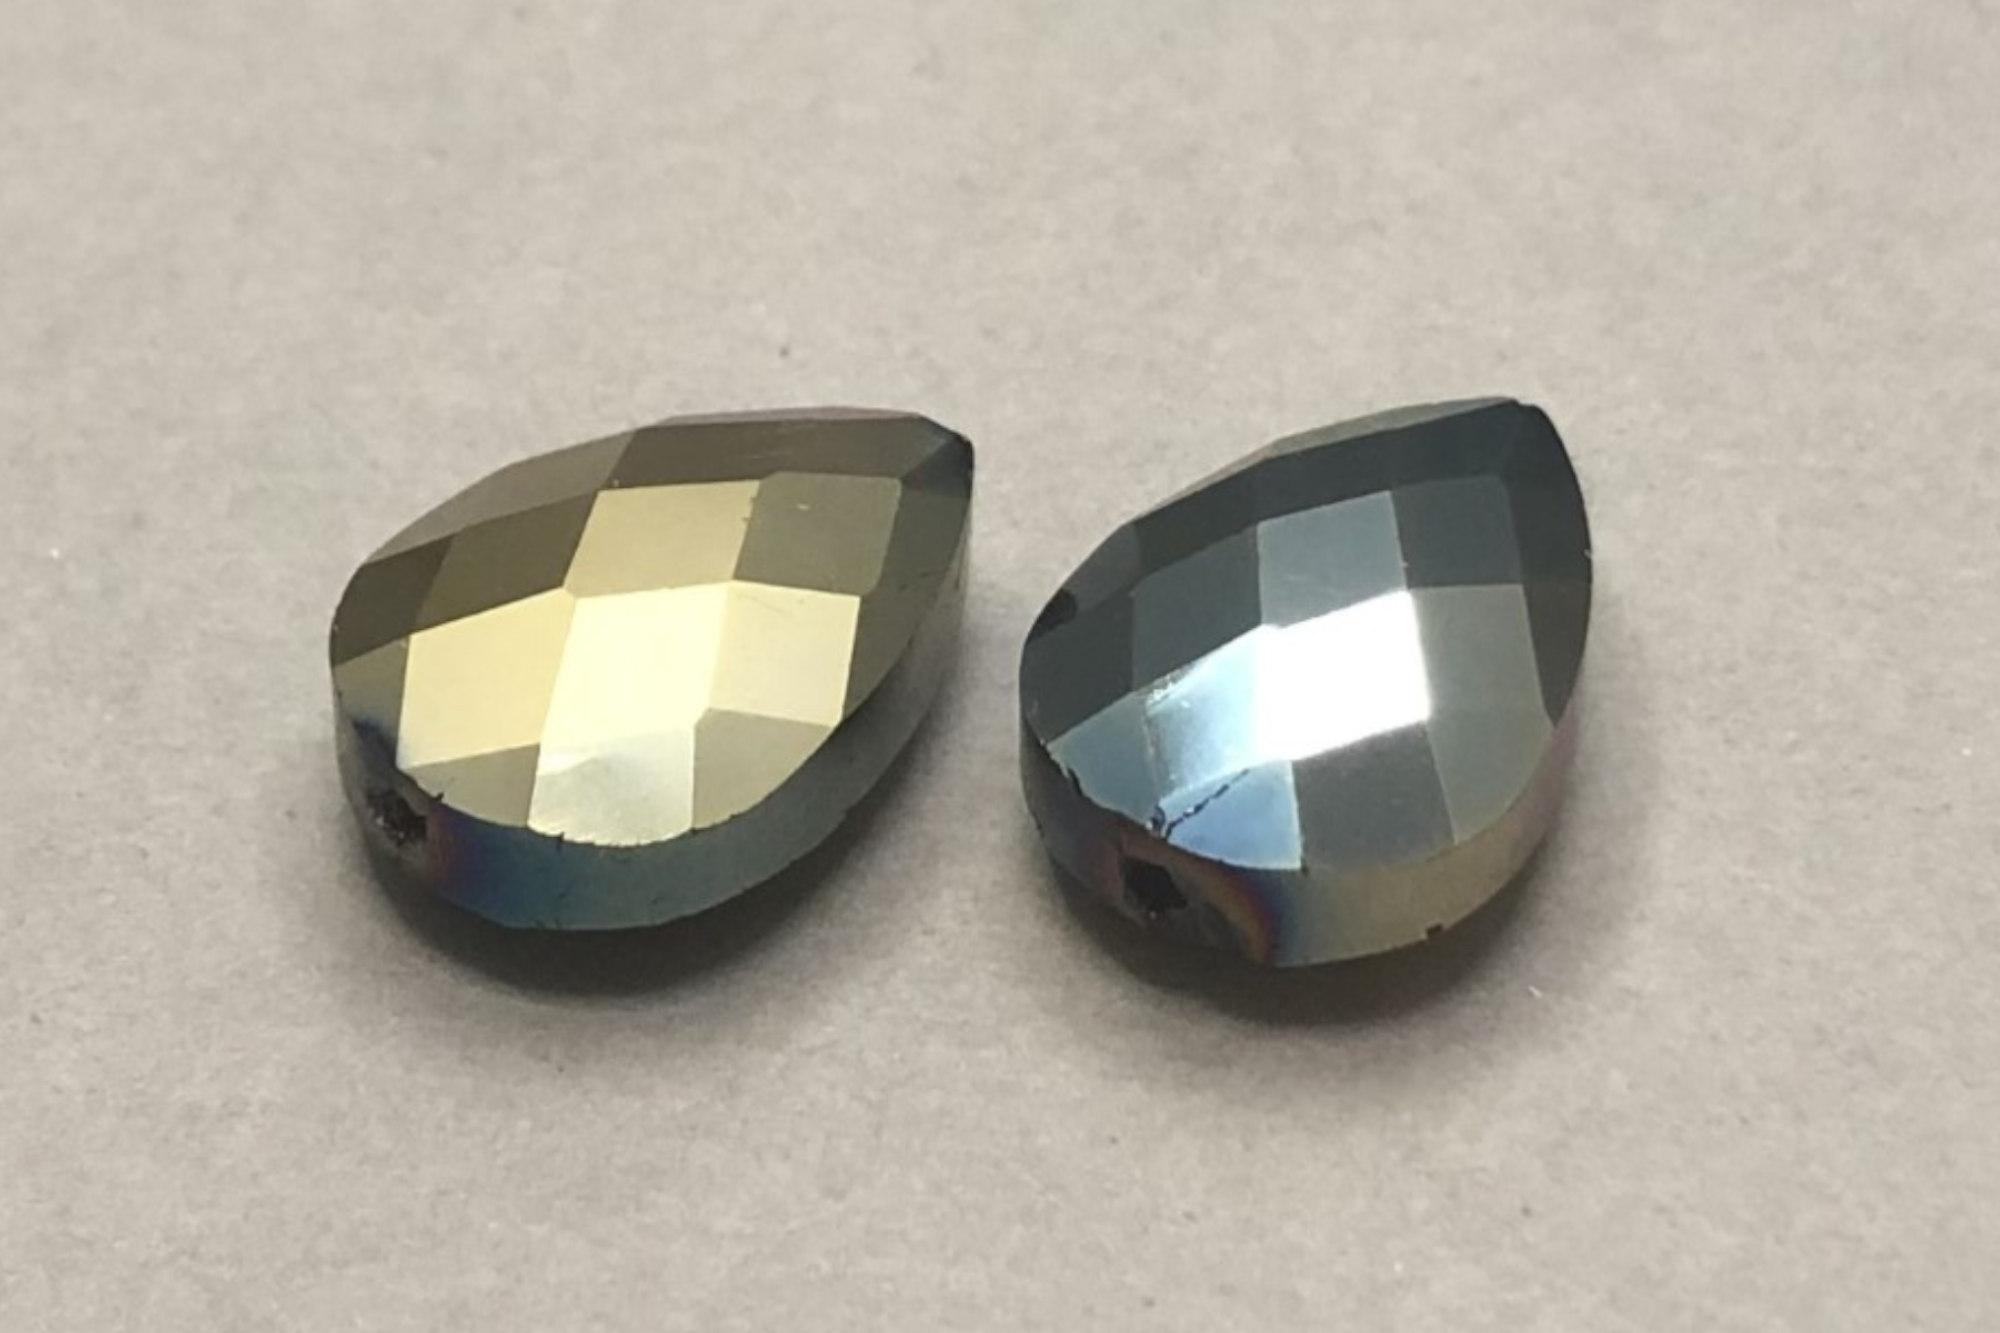 Metallic Teal/Light Bronze Pear Shape Faceted Glass Bead 18x13x8mm